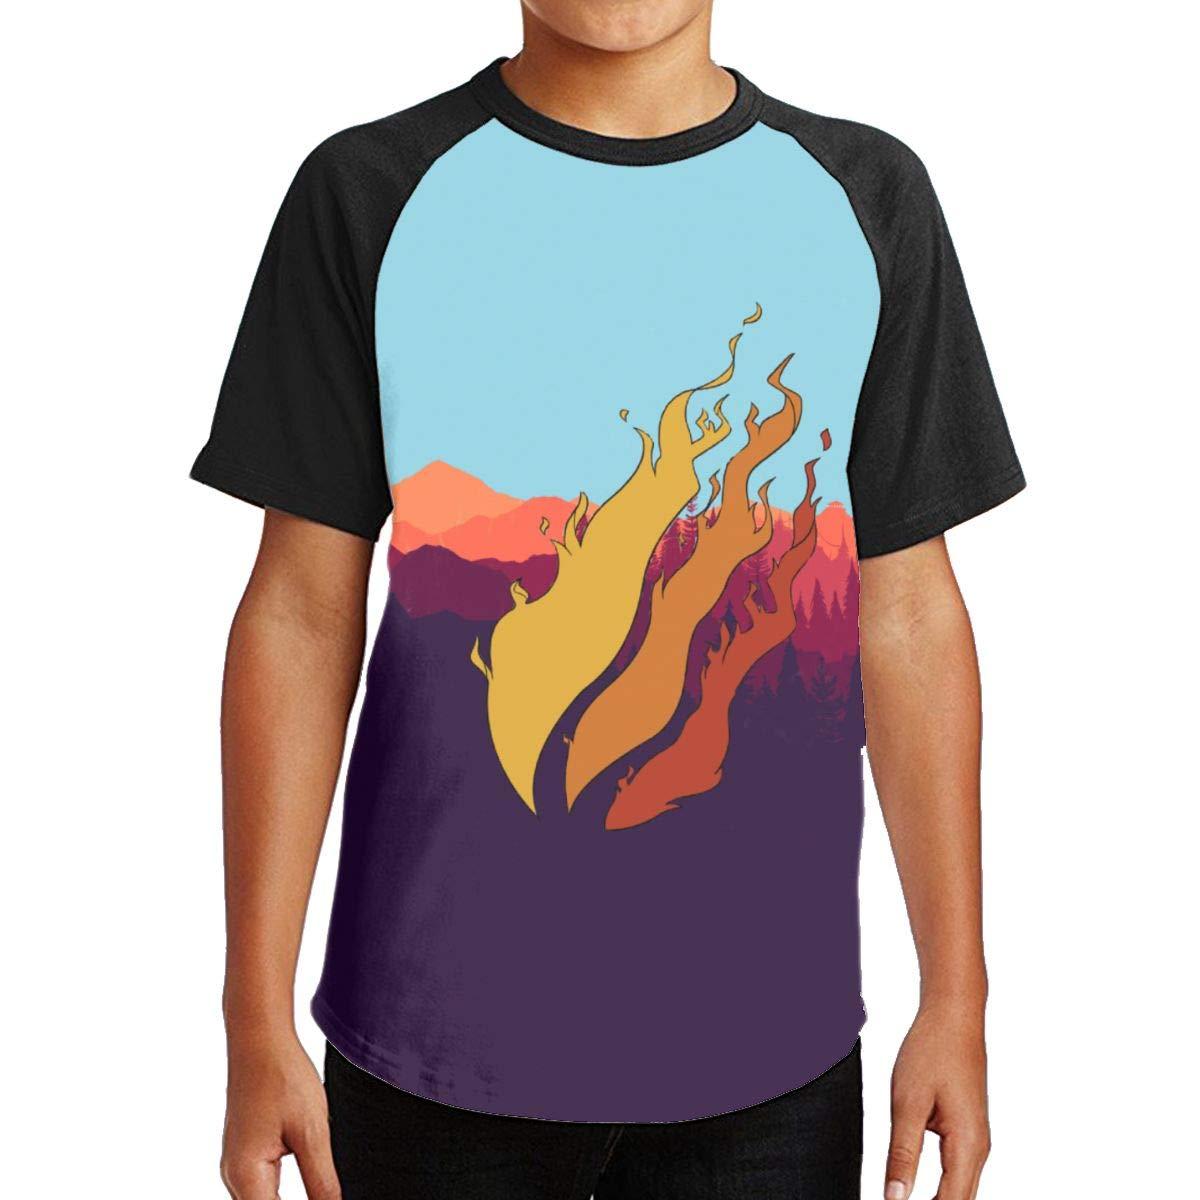 Preston Play TBNRF-Rags Game Kids T Shirt 3D Printed Short Sleeve Fashion Casual Youth Tees Shirts for Girls Boys Children